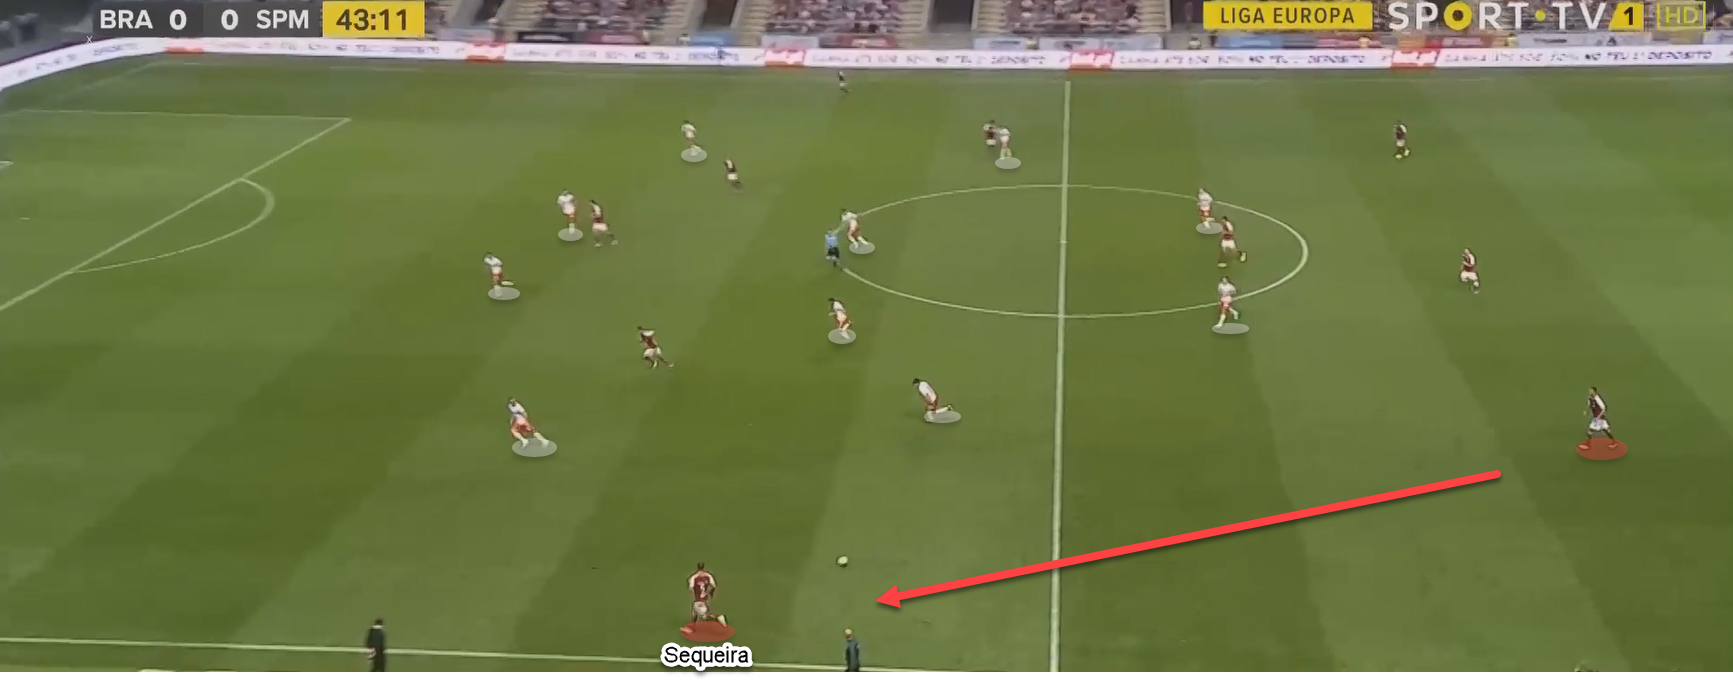 Europa League 2019/20: Braga vs Spartak Moscow tactics